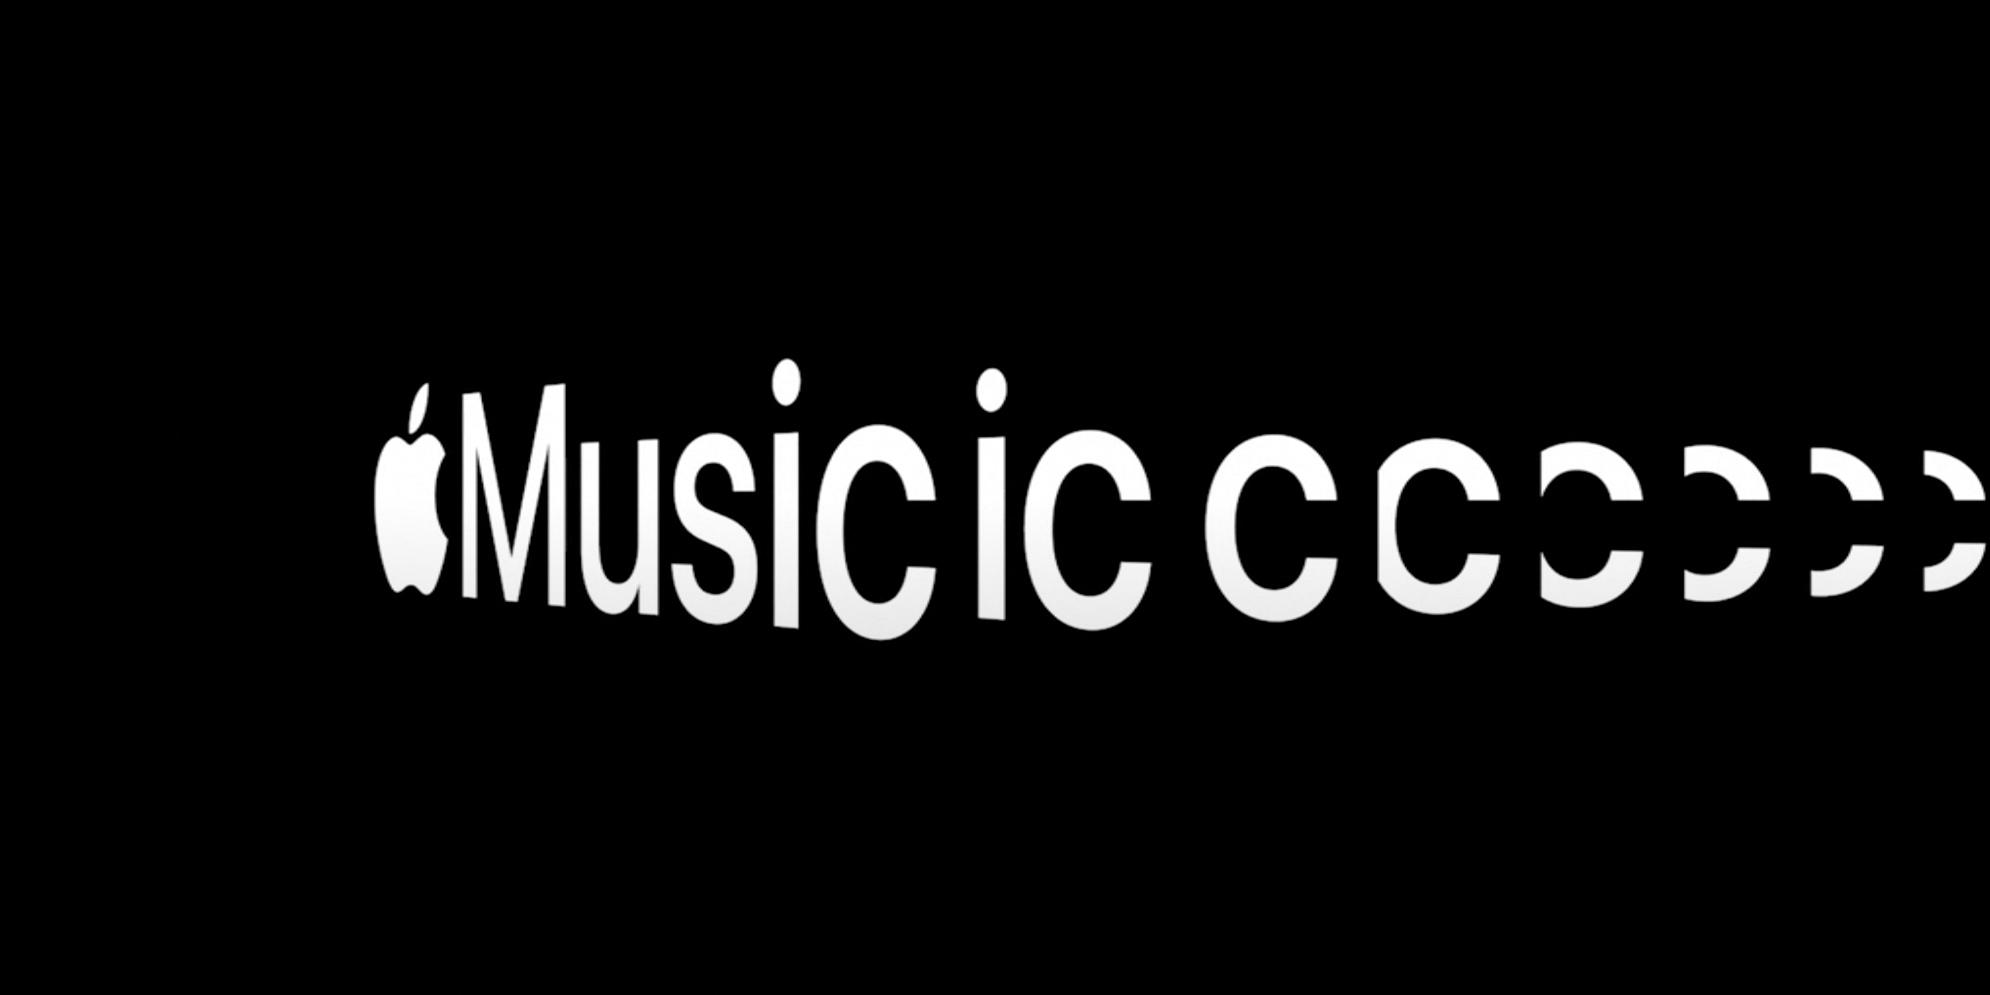 apple-music-lossless.jpg?w=2500&quality=